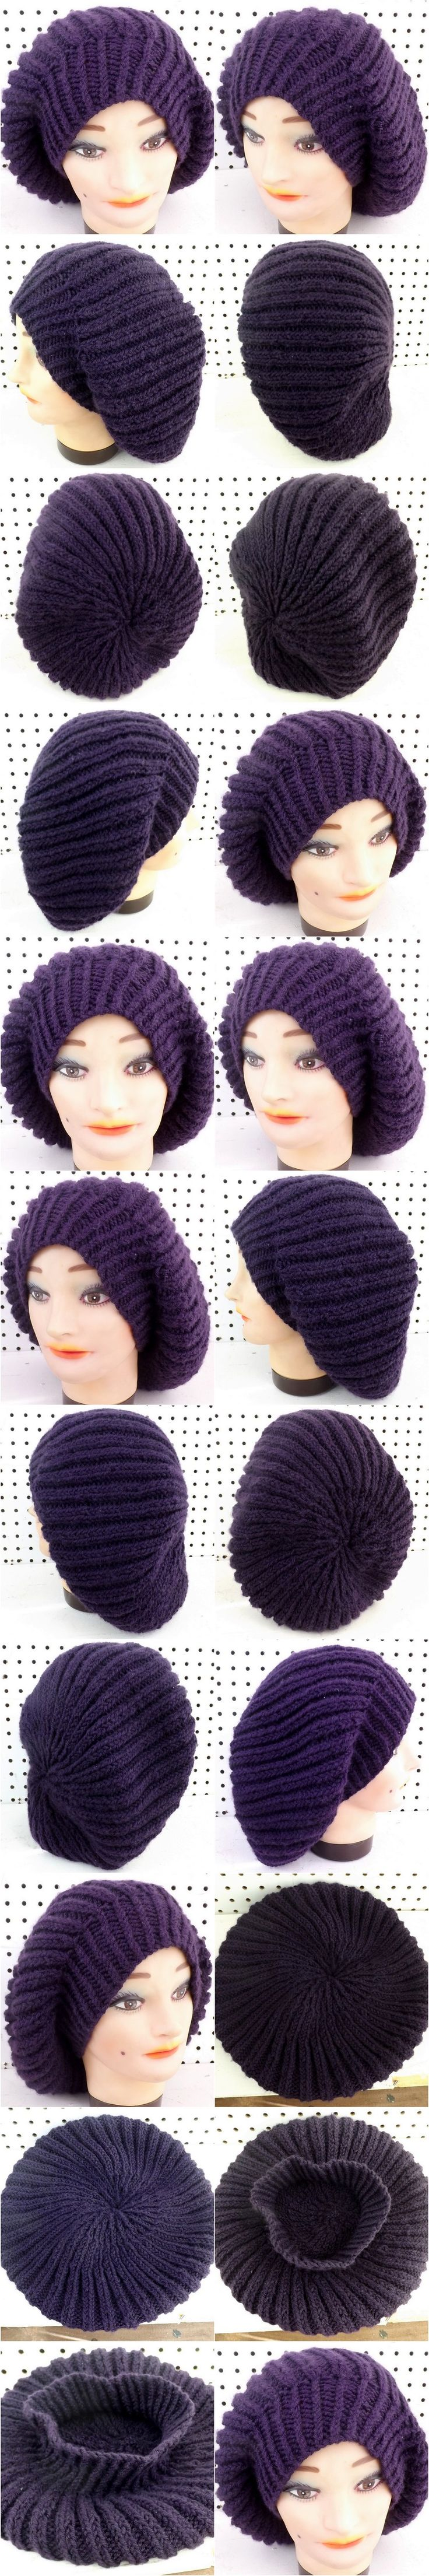 https://www.etsy.com/listing/161701053/knit-pattern-mary-knit-beret-hat-pattern?ref=listing-shop-header-3 MARY Knit Slouchy Beret Hat Pattern #crochet #berethat